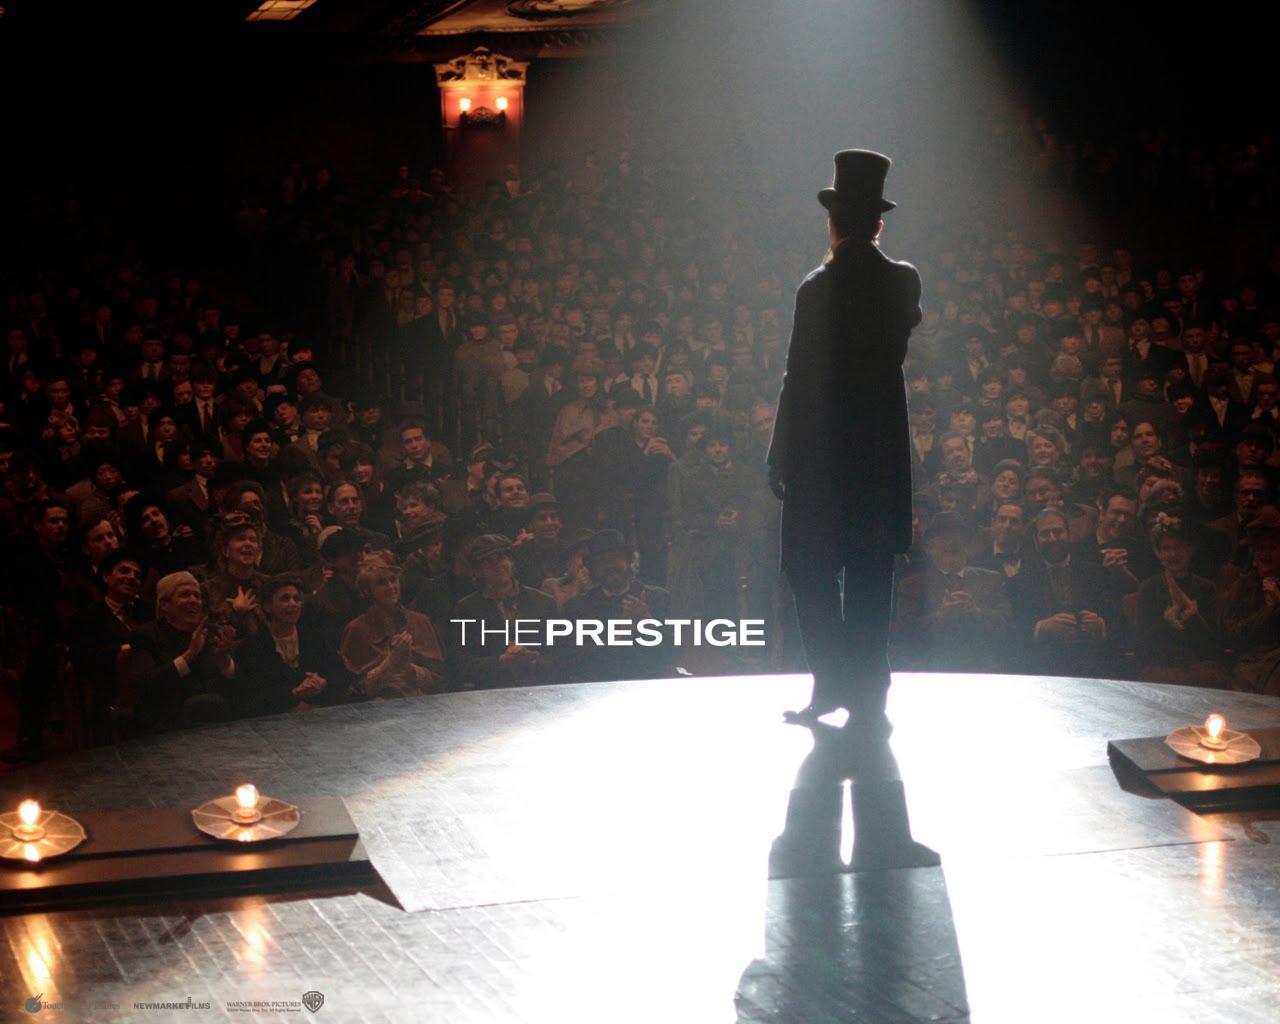 http://2.bp.blogspot.com/_Y1ZkwH0yMGM/TR9CKWrvnXI/AAAAAAAACZY/Ce4fObeUo1Y/s1600/the_prestige.jpg